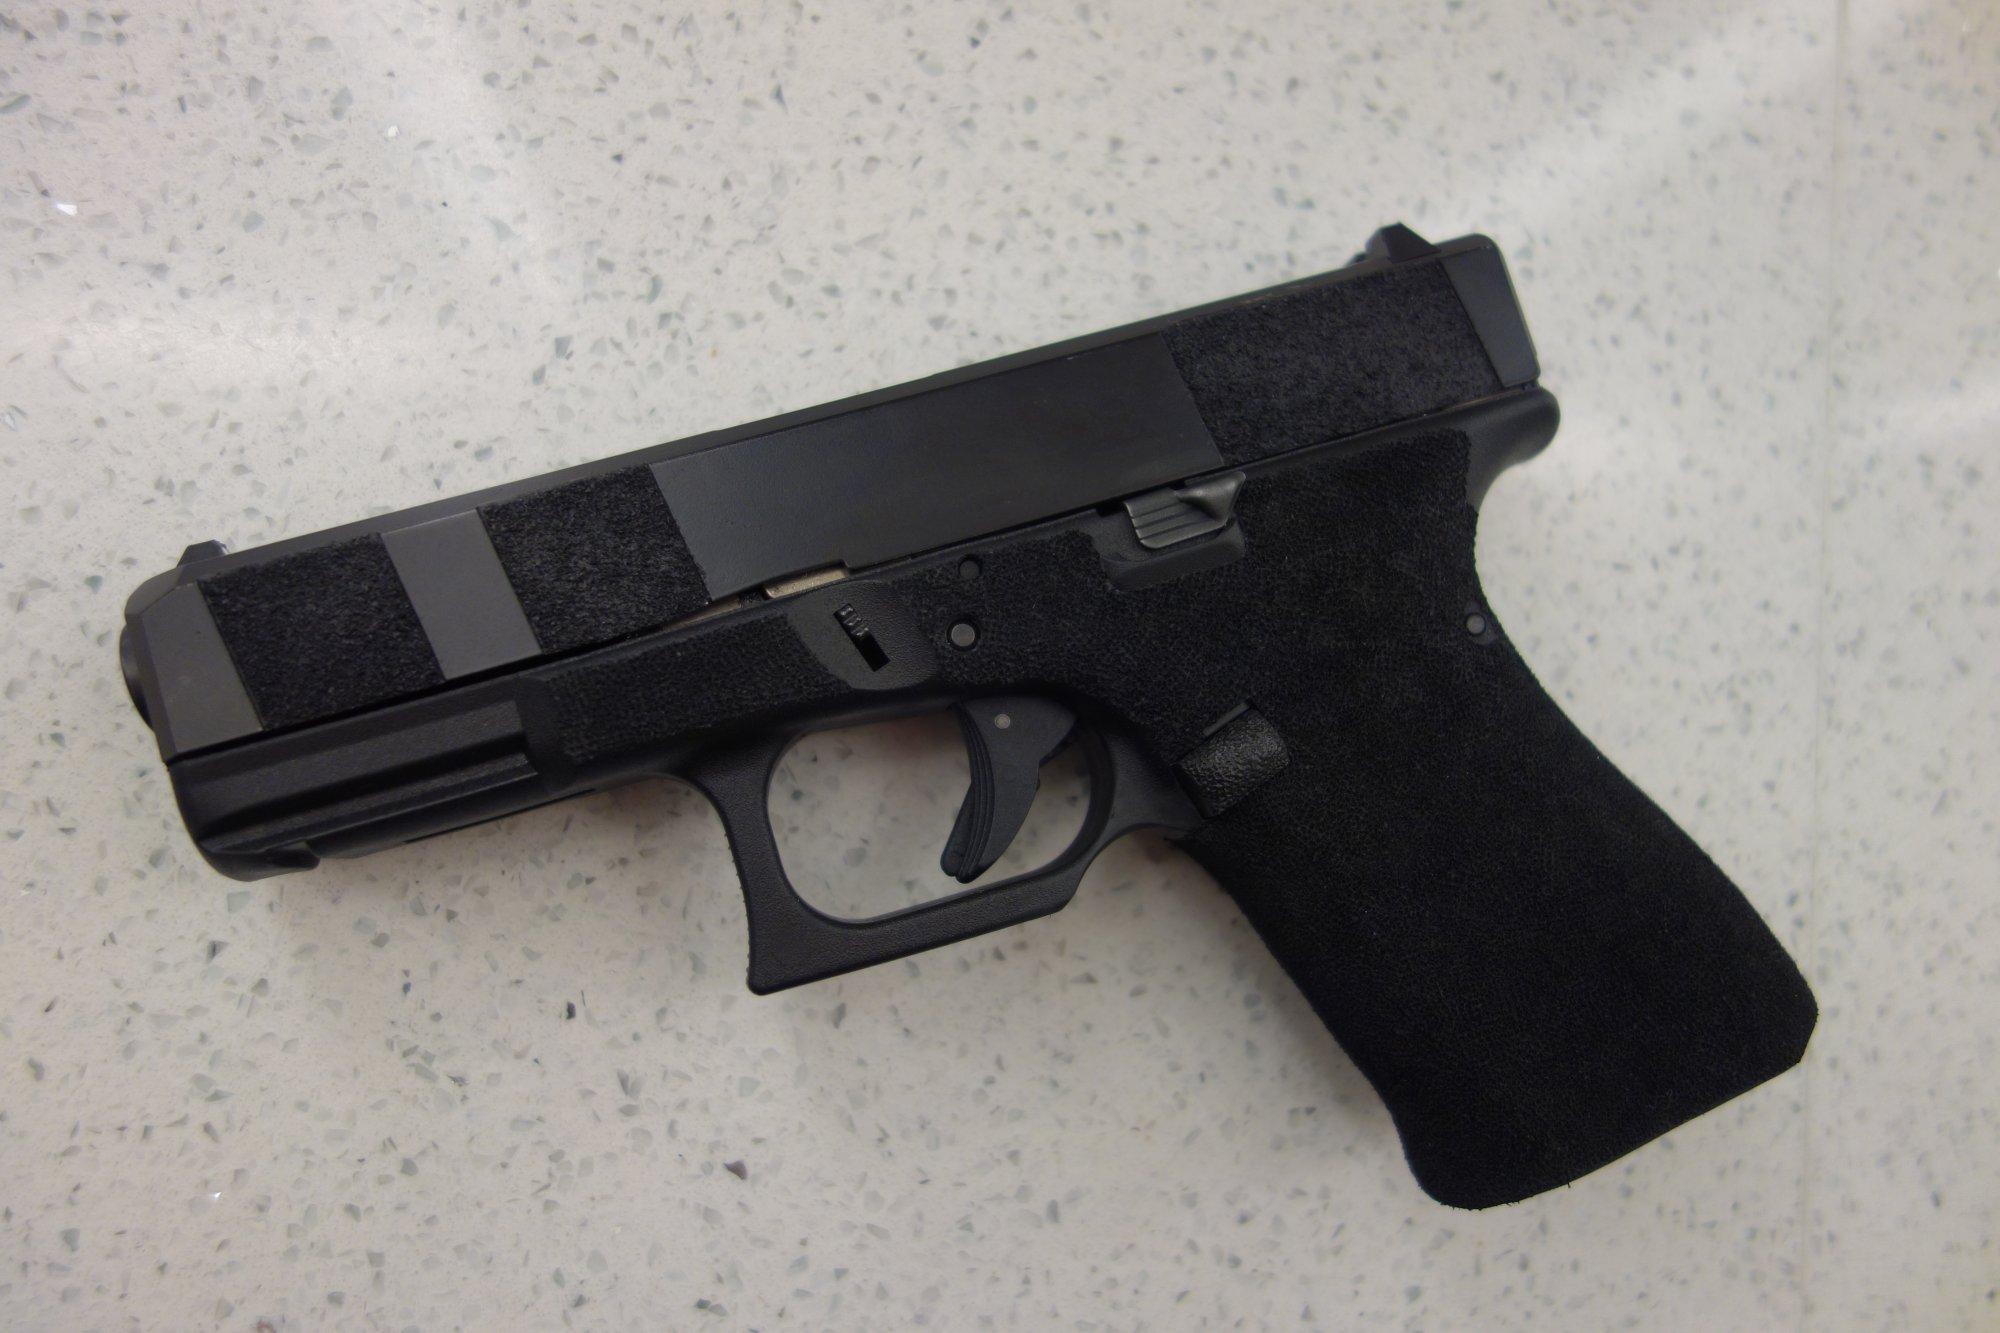 U S  Naval Special Warfare (NSW) Adopts Glock 19 (G19